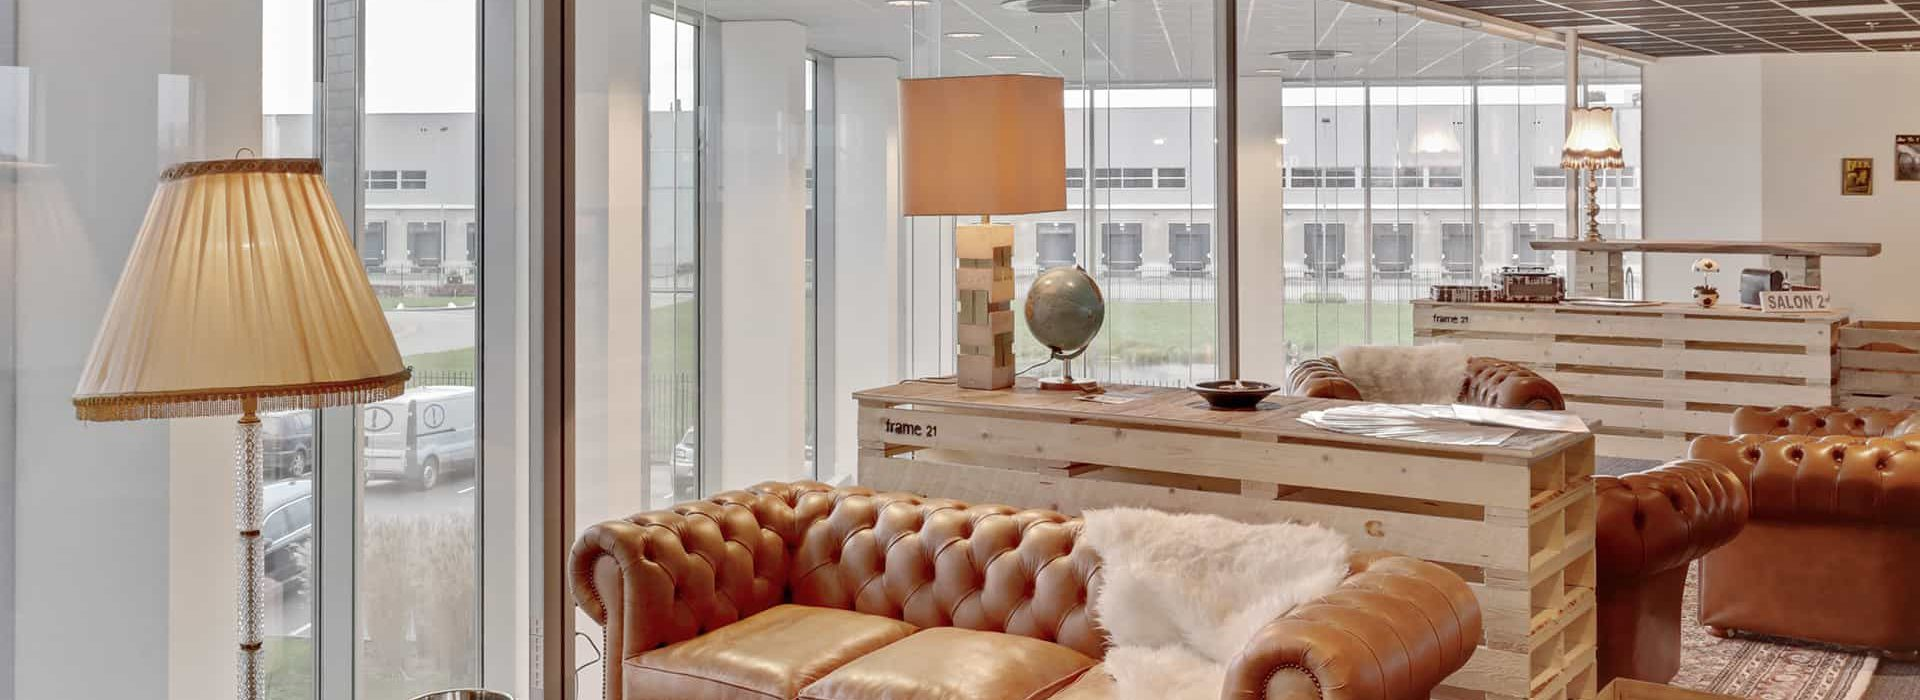 Frame21 - Club Lounge